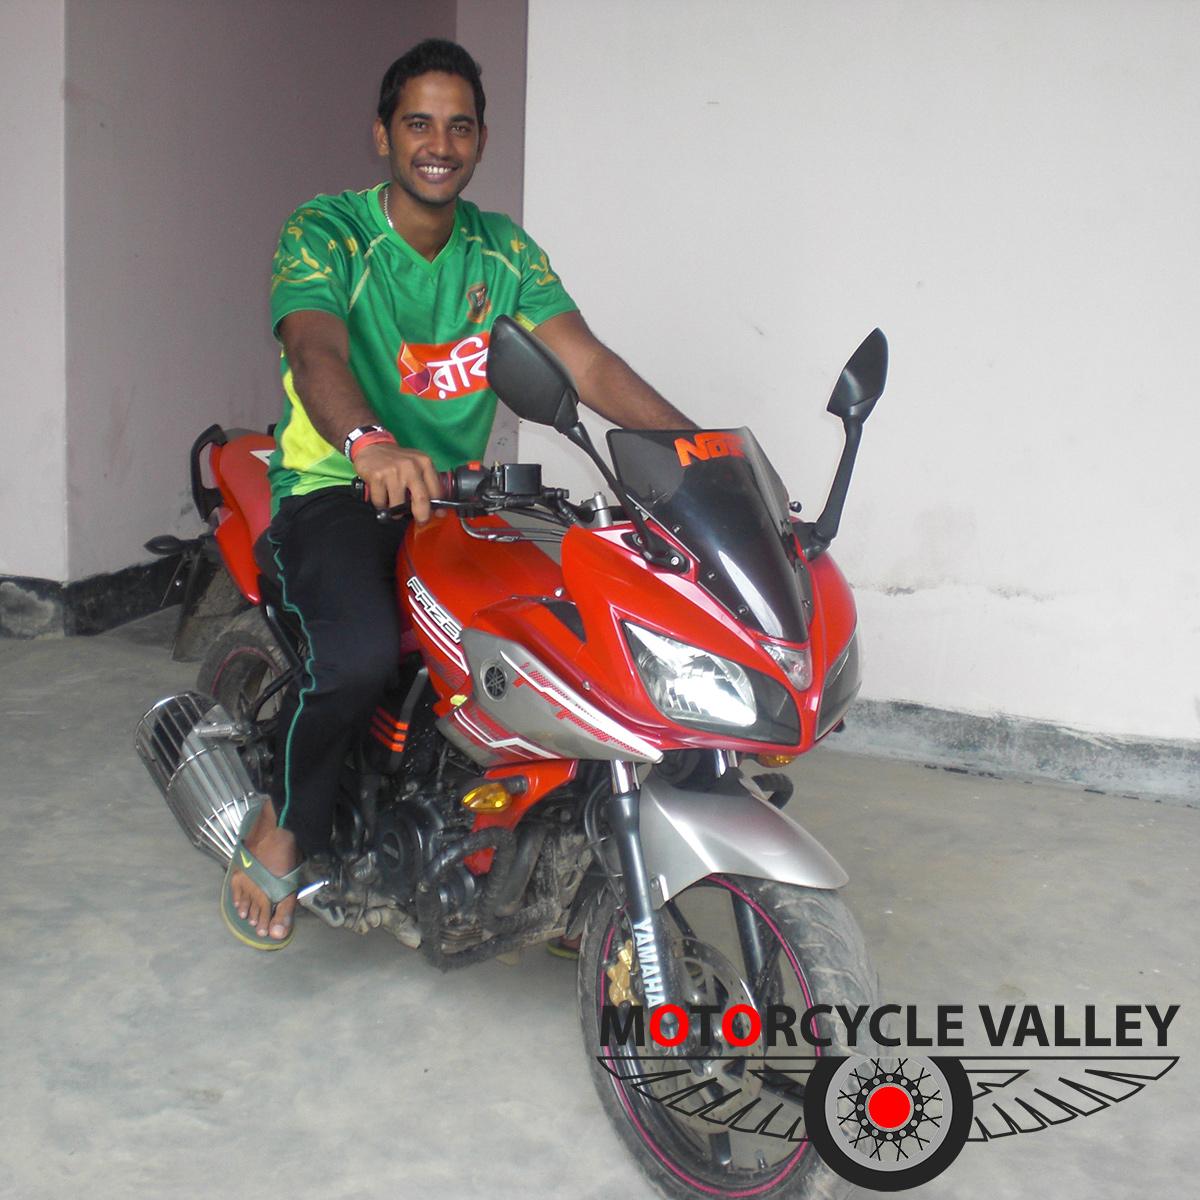 Yamaha Fazer Motorcycle review by Muktar Ali